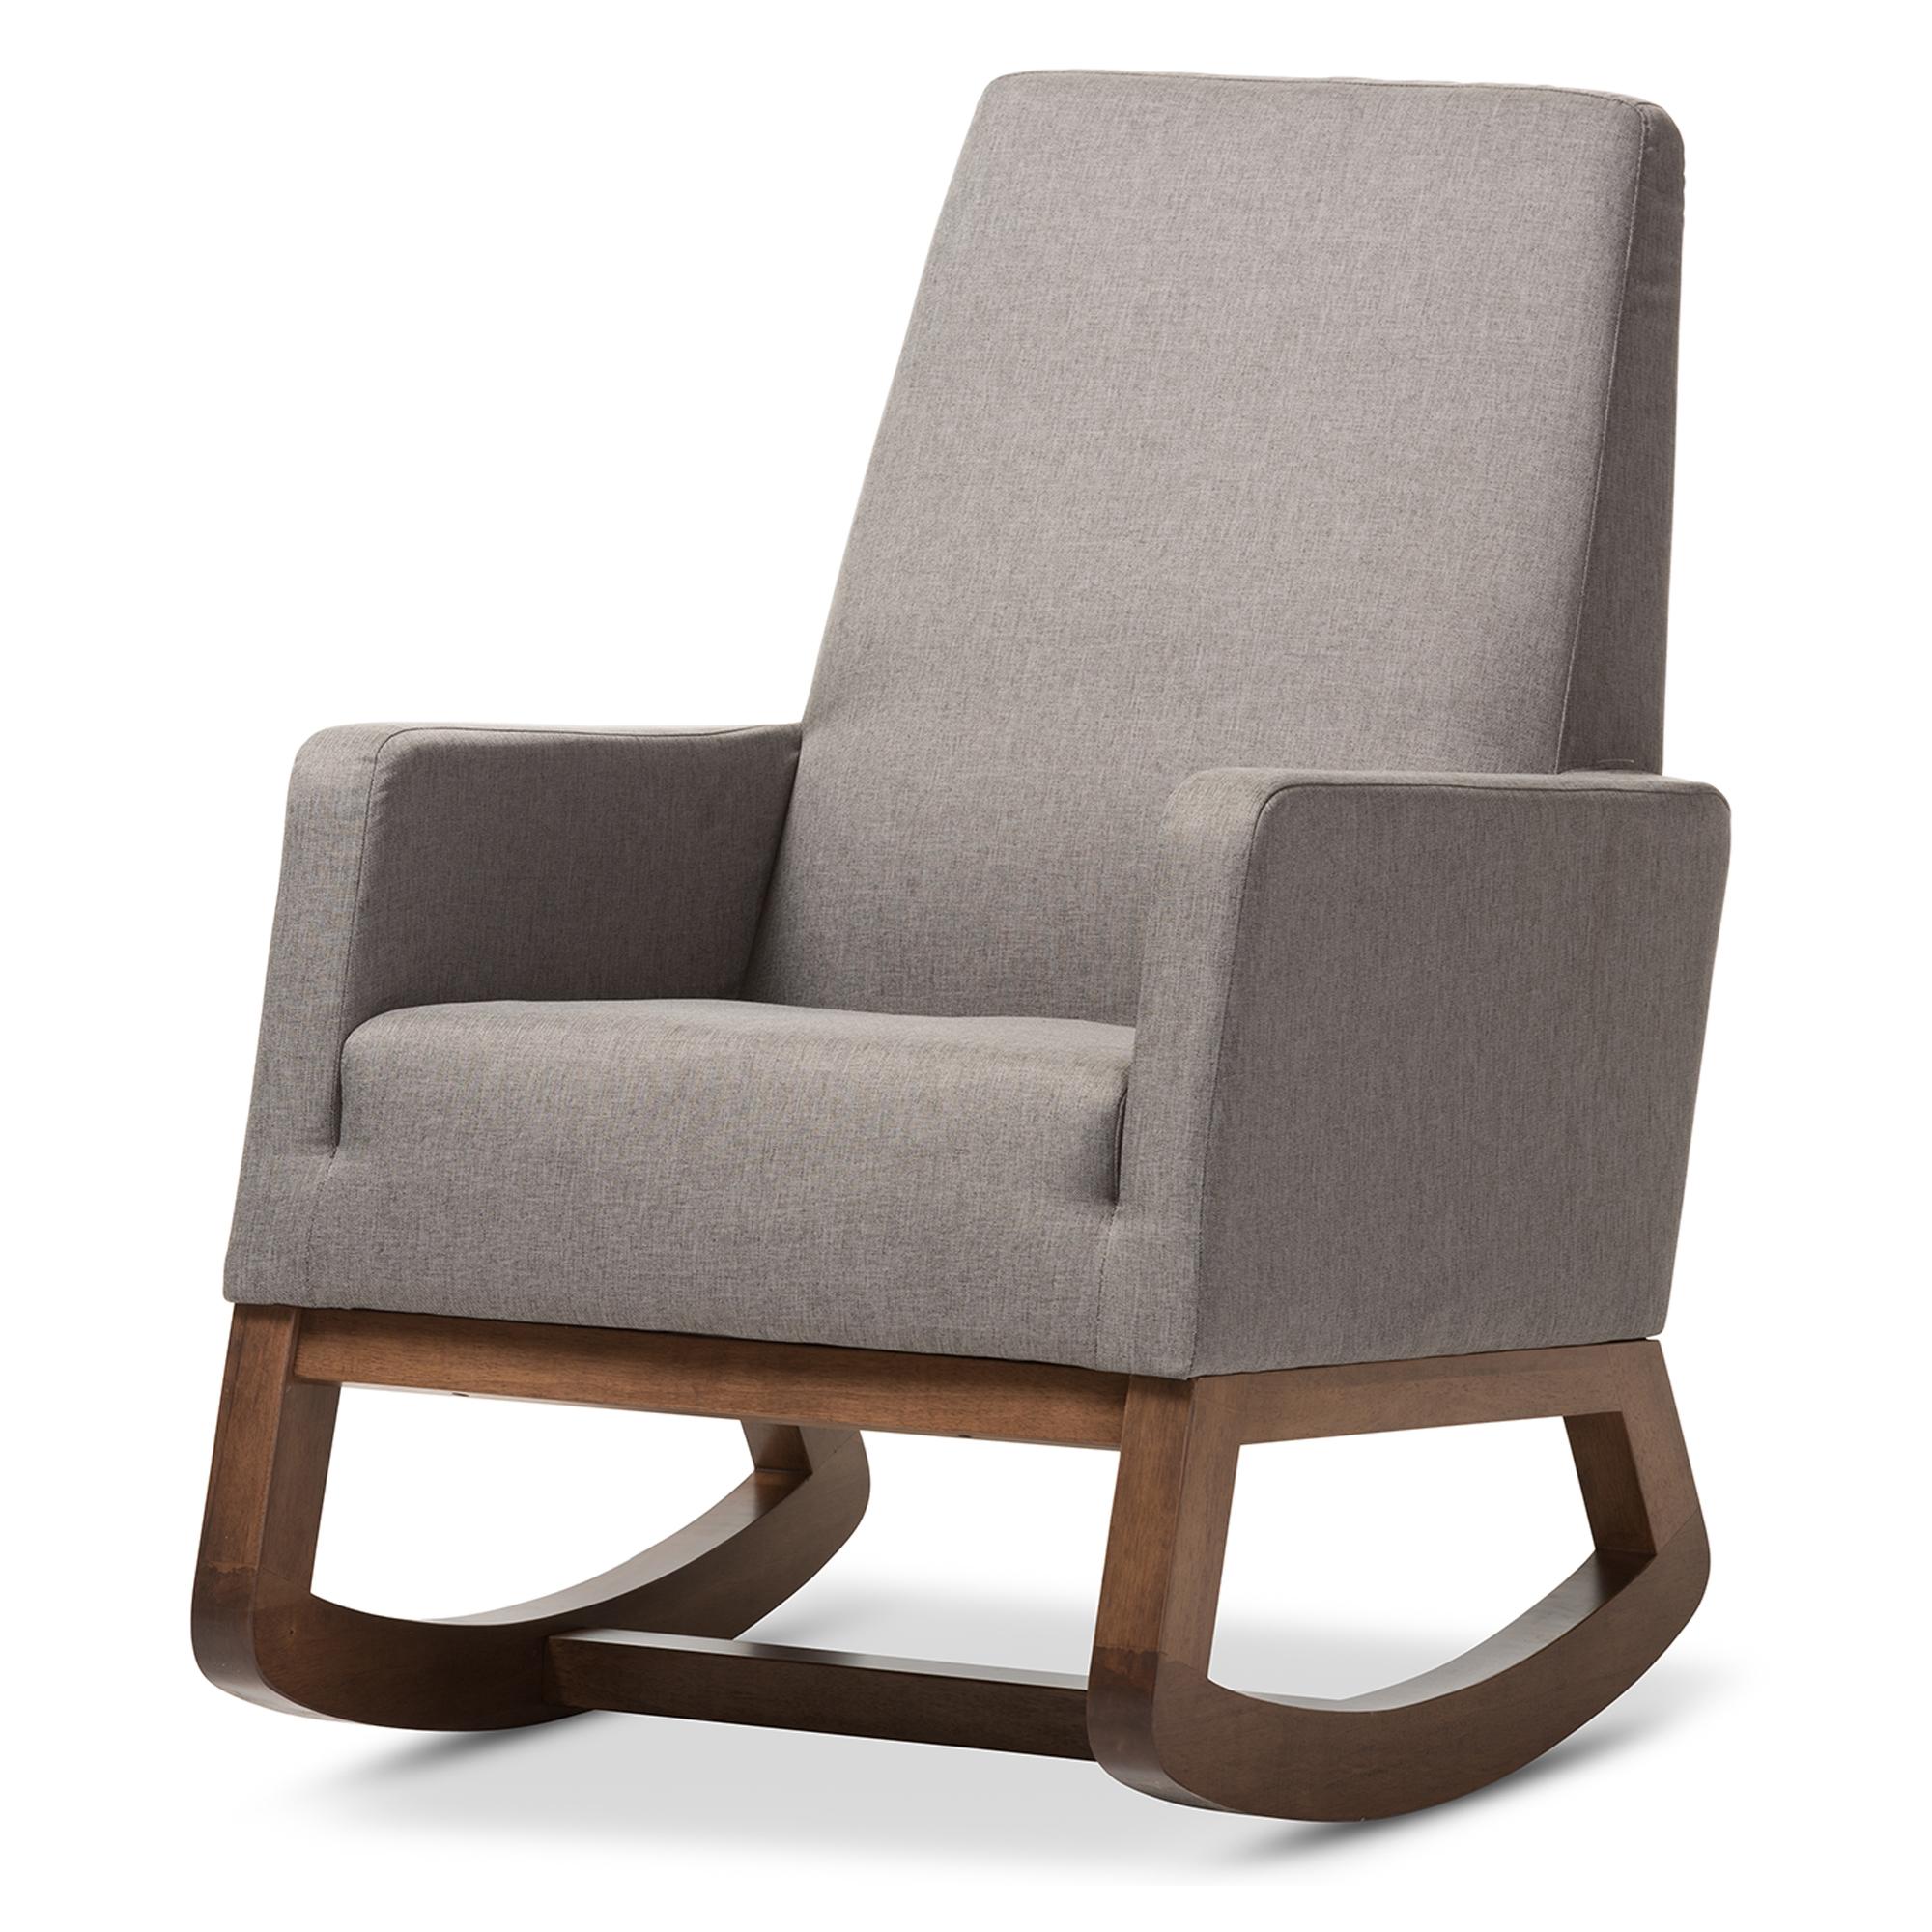 ... Baxton Studio Yashiya Mid Century Retro Modern Grey Fabric Upholstered  Rocking Chair   BSOBBT5199  ...